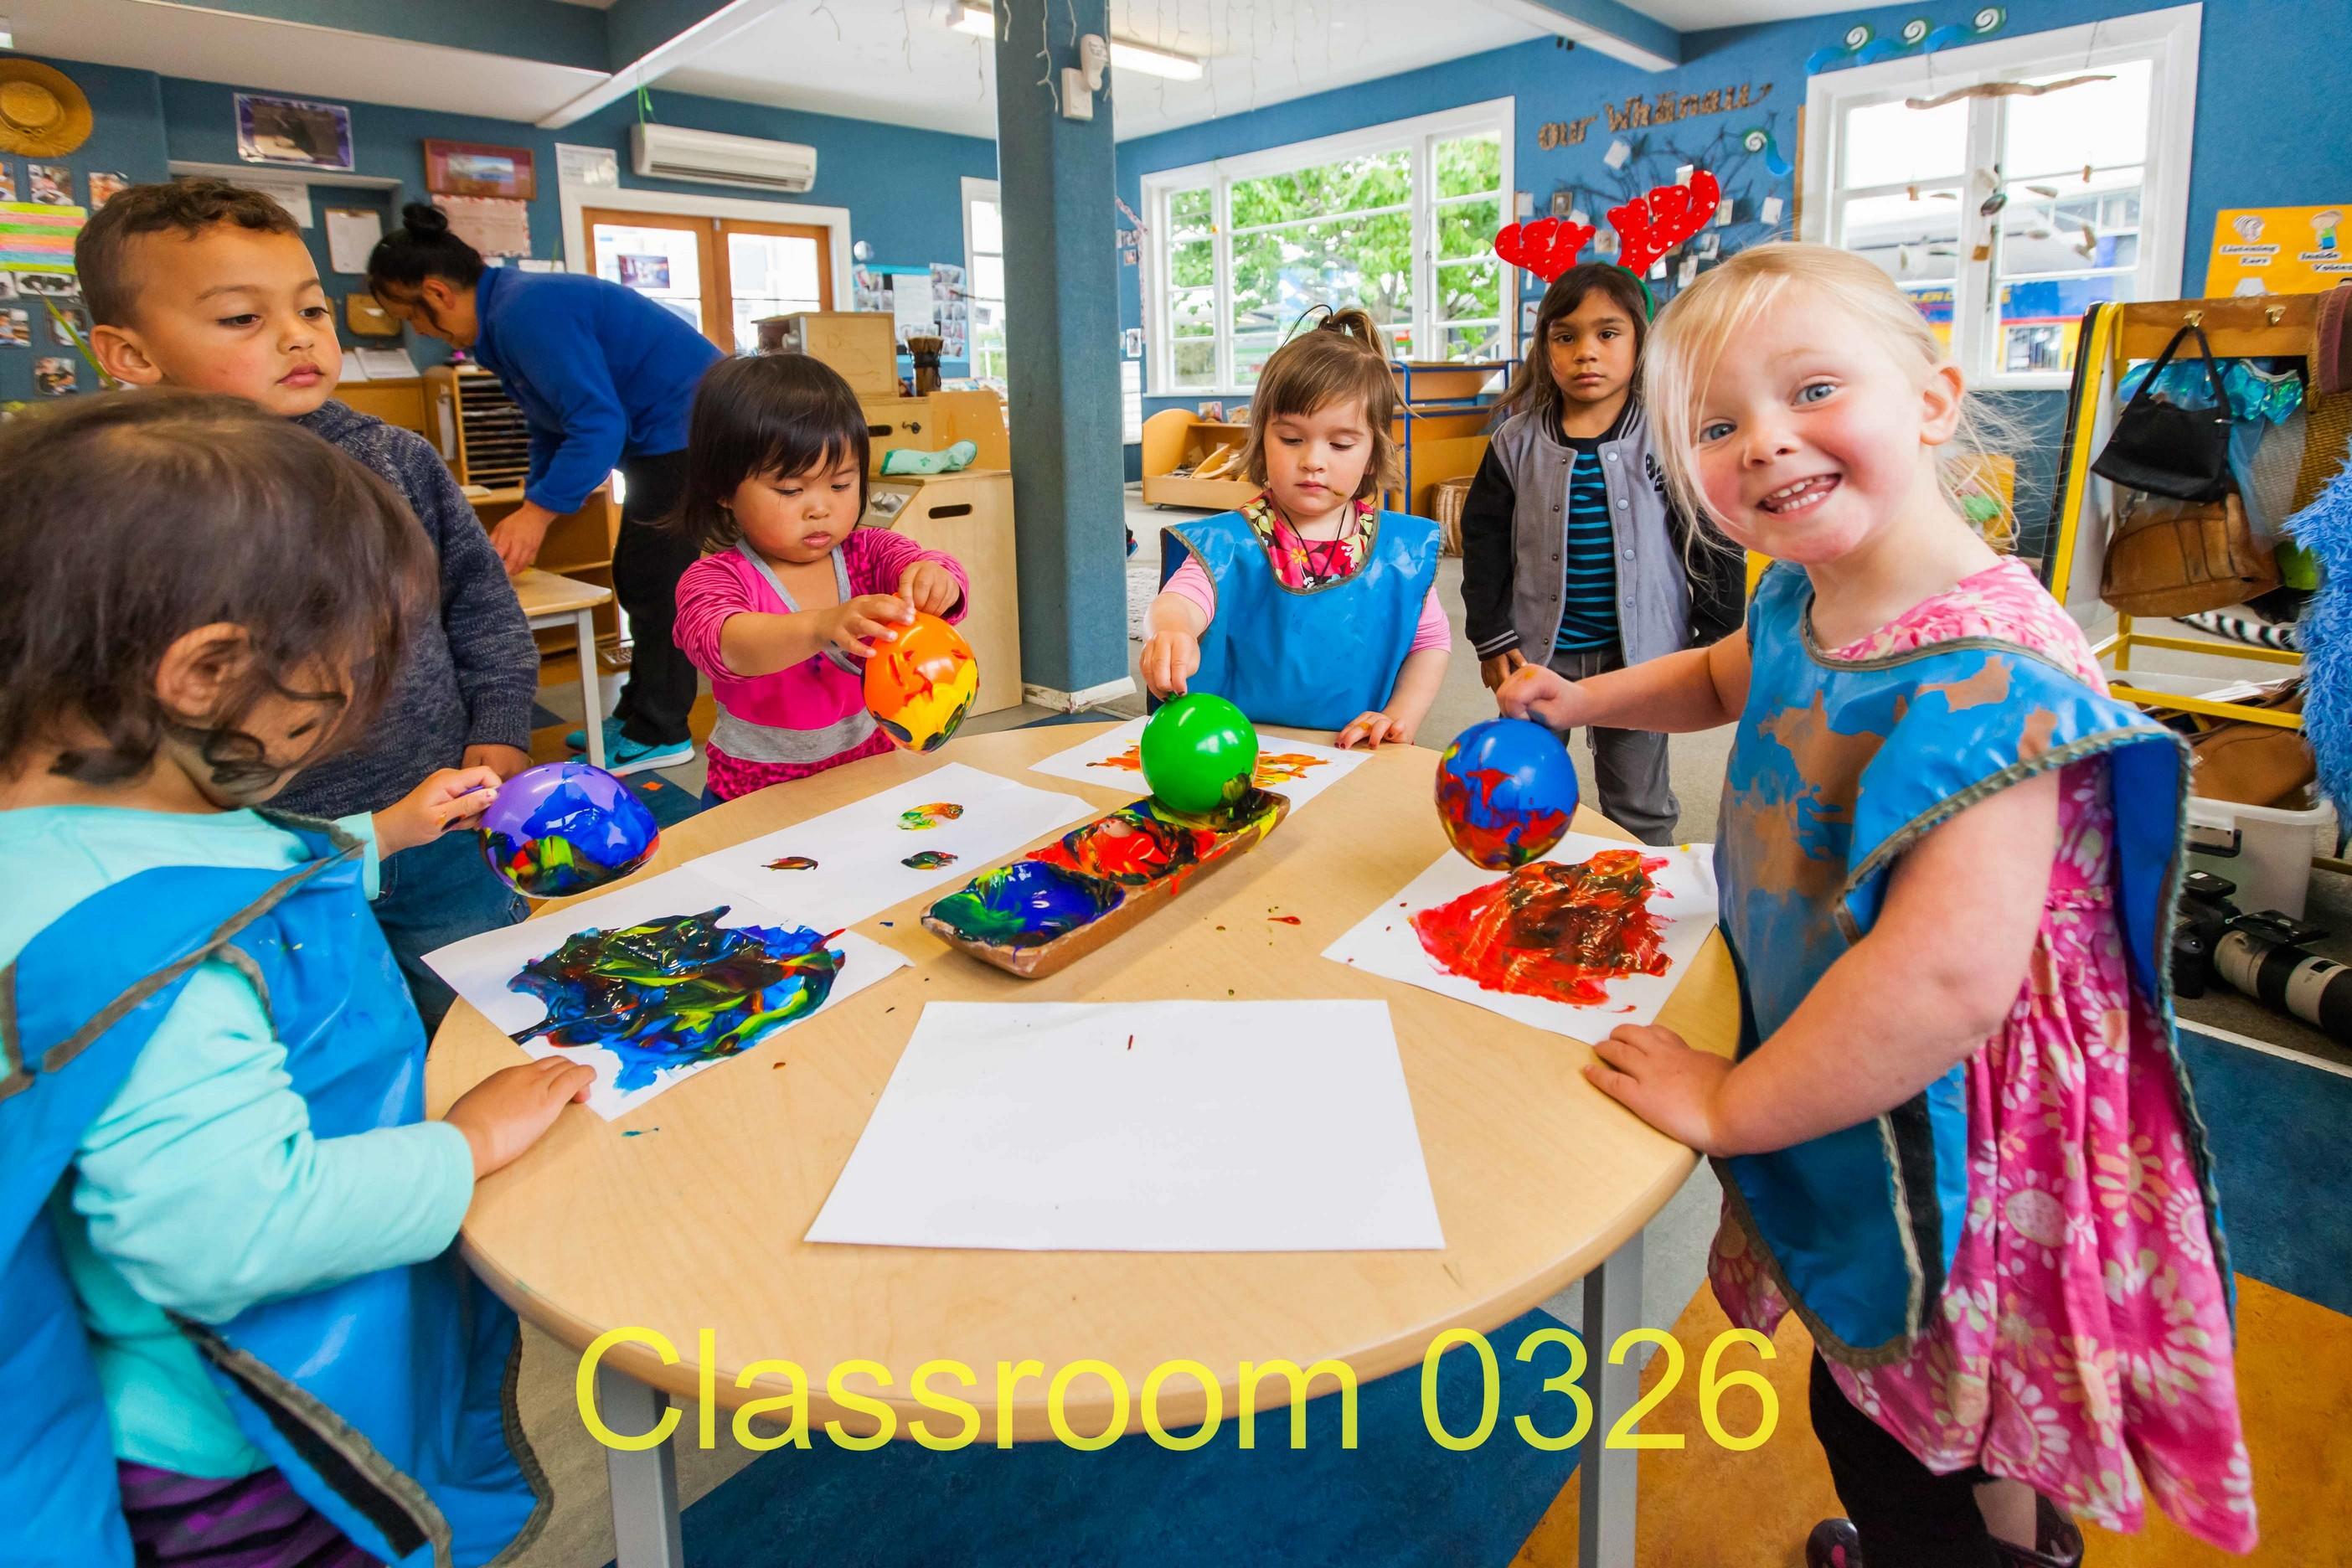 Classroom 0326